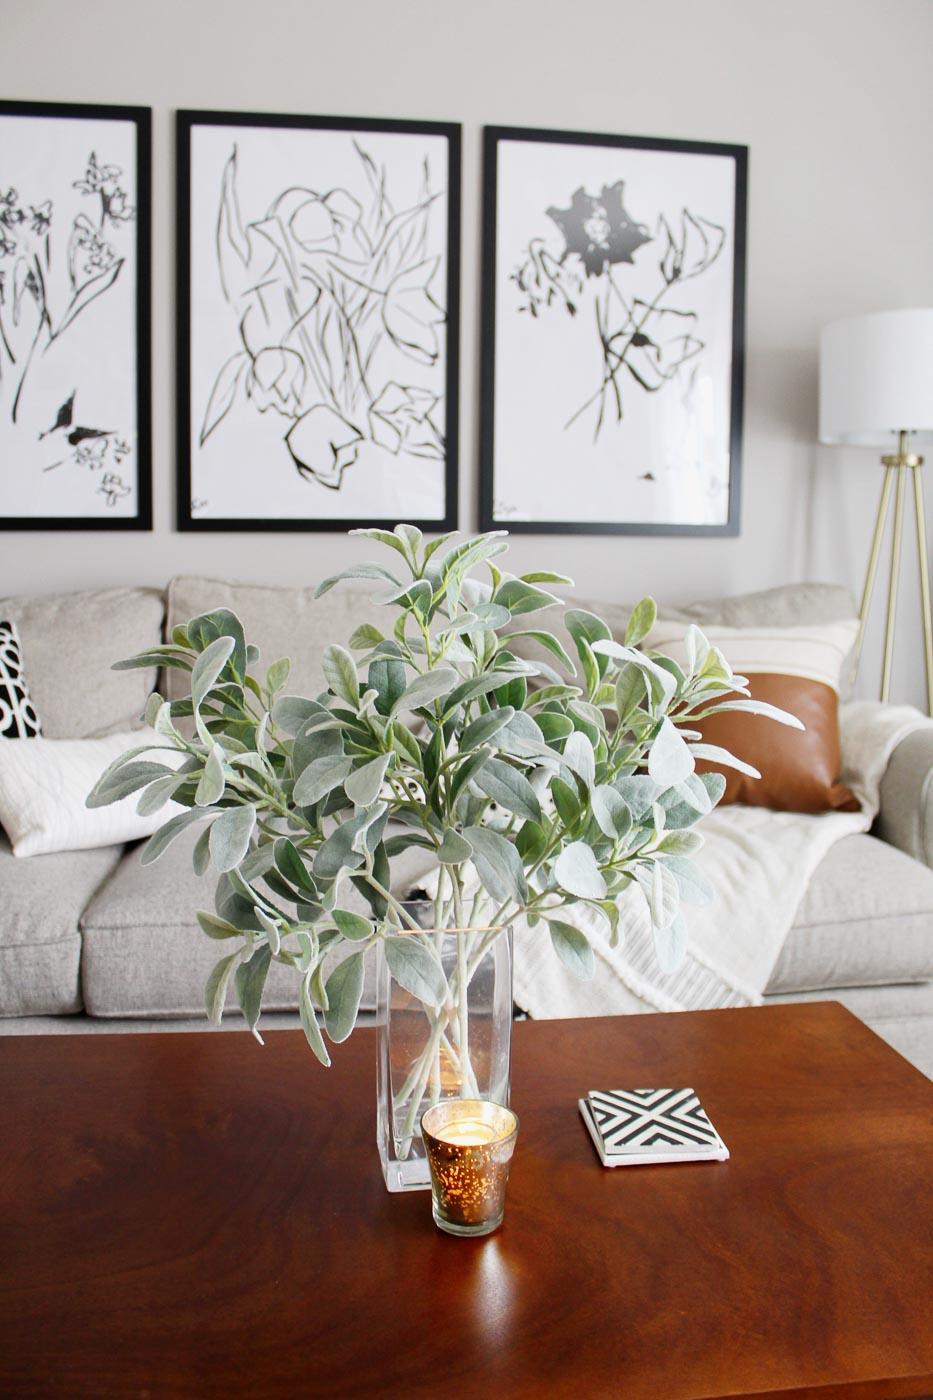 cozy-quarters-ohio-natural-light-photography-studio-lifestyle-photographer-21.jpg